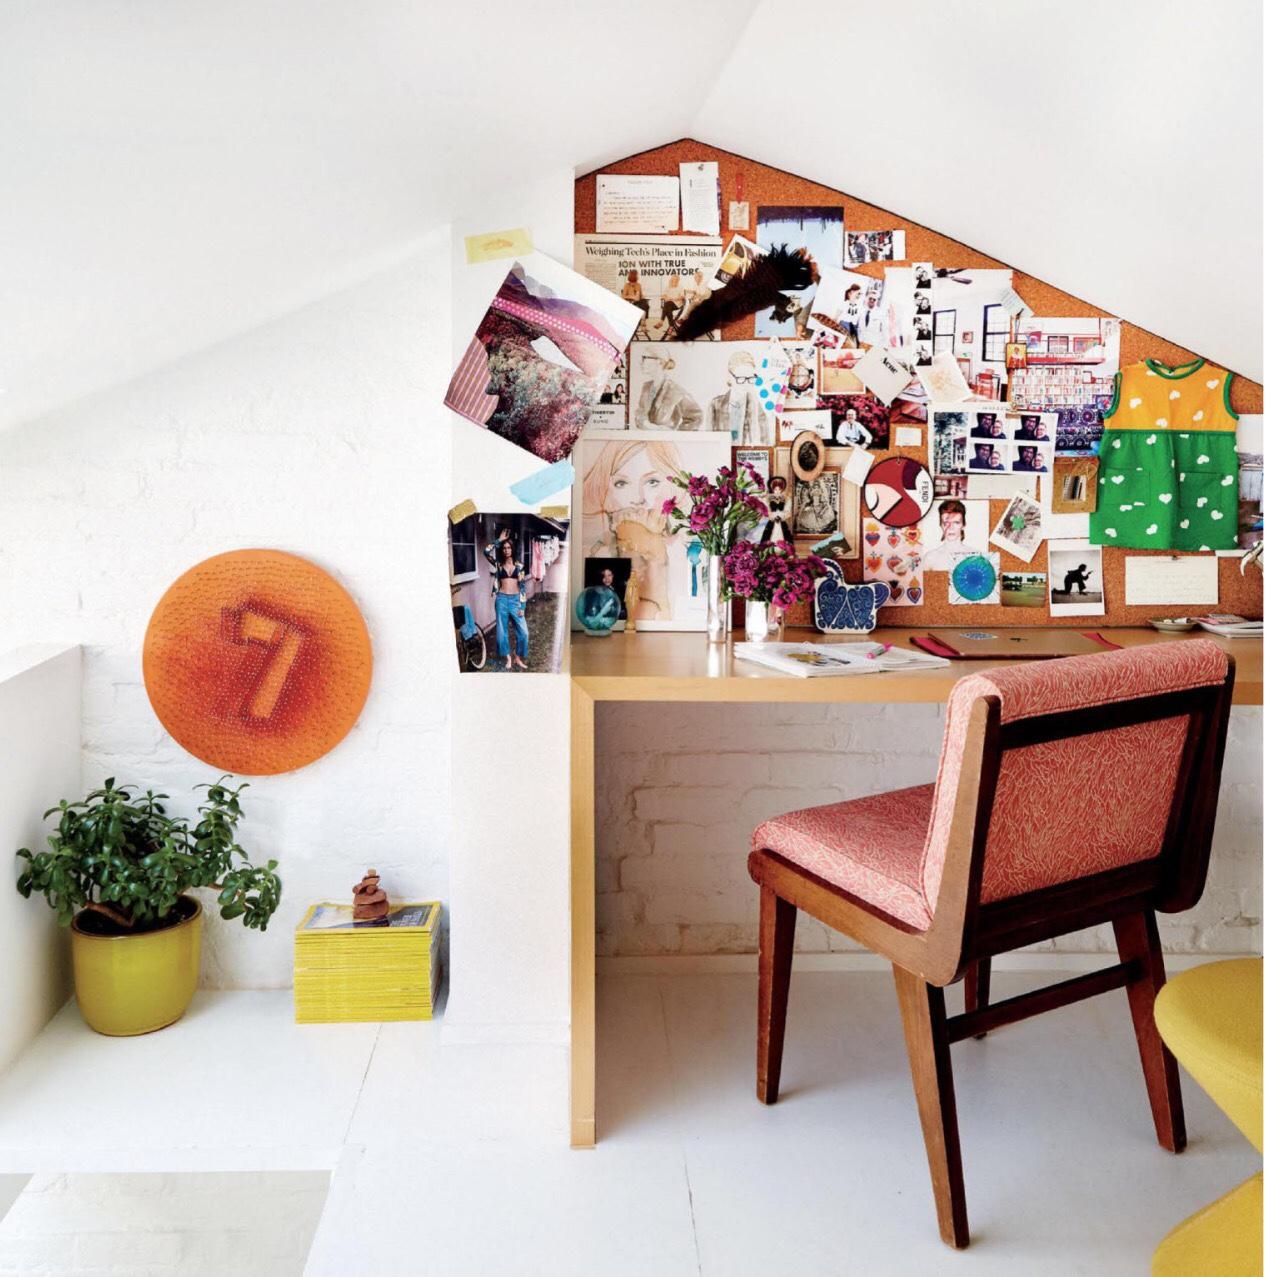 Inspiración en decoración de interiores de oficinas #60 - Espacios Creativos